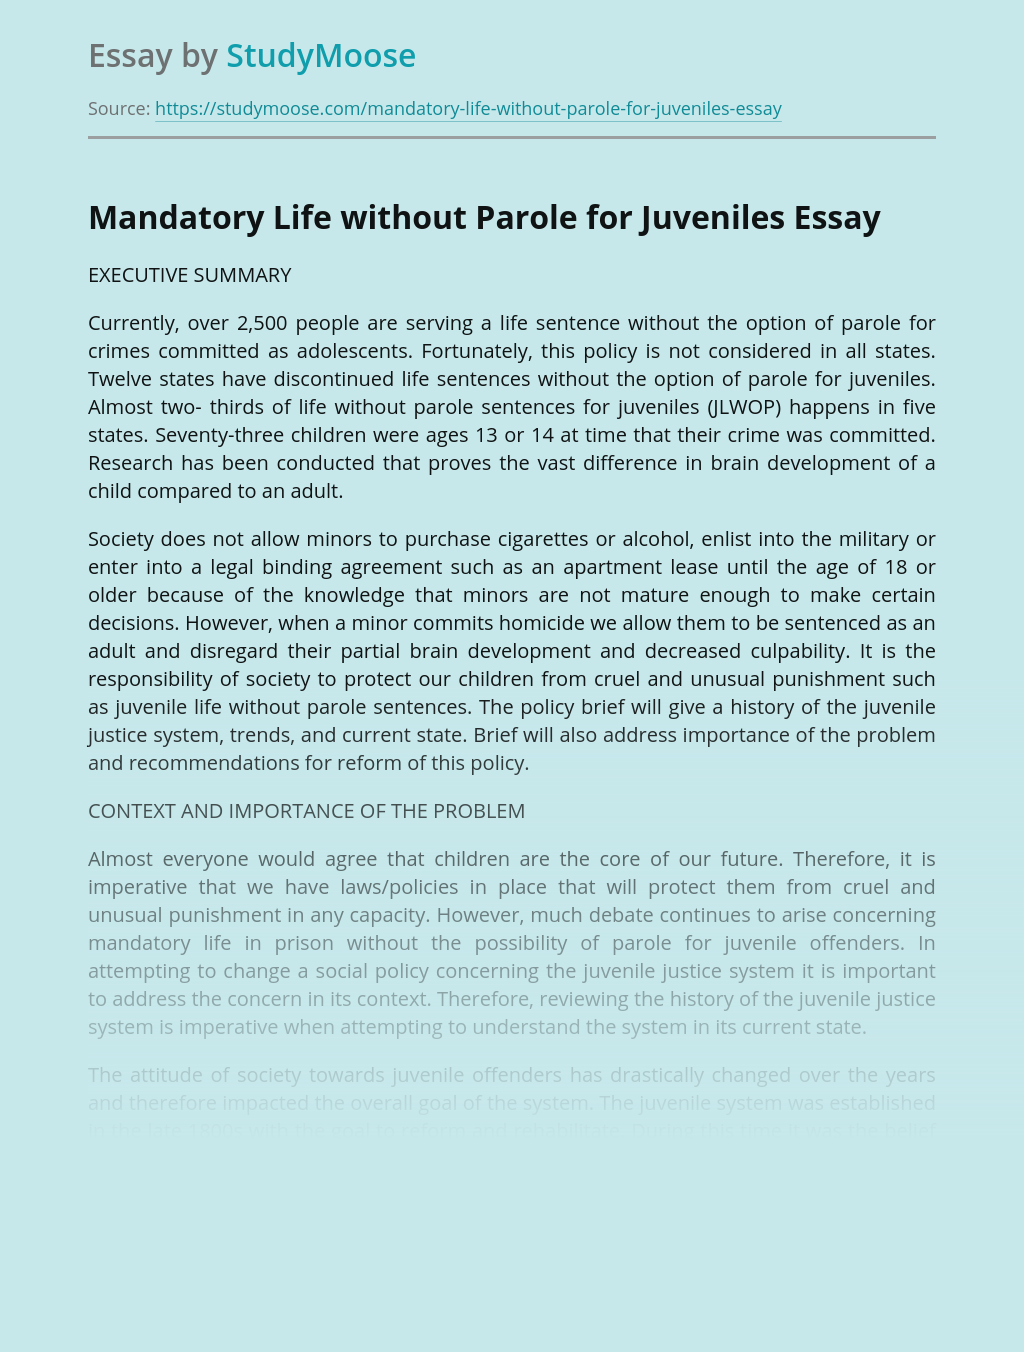 Mandatory Life without Parole for Juveniles